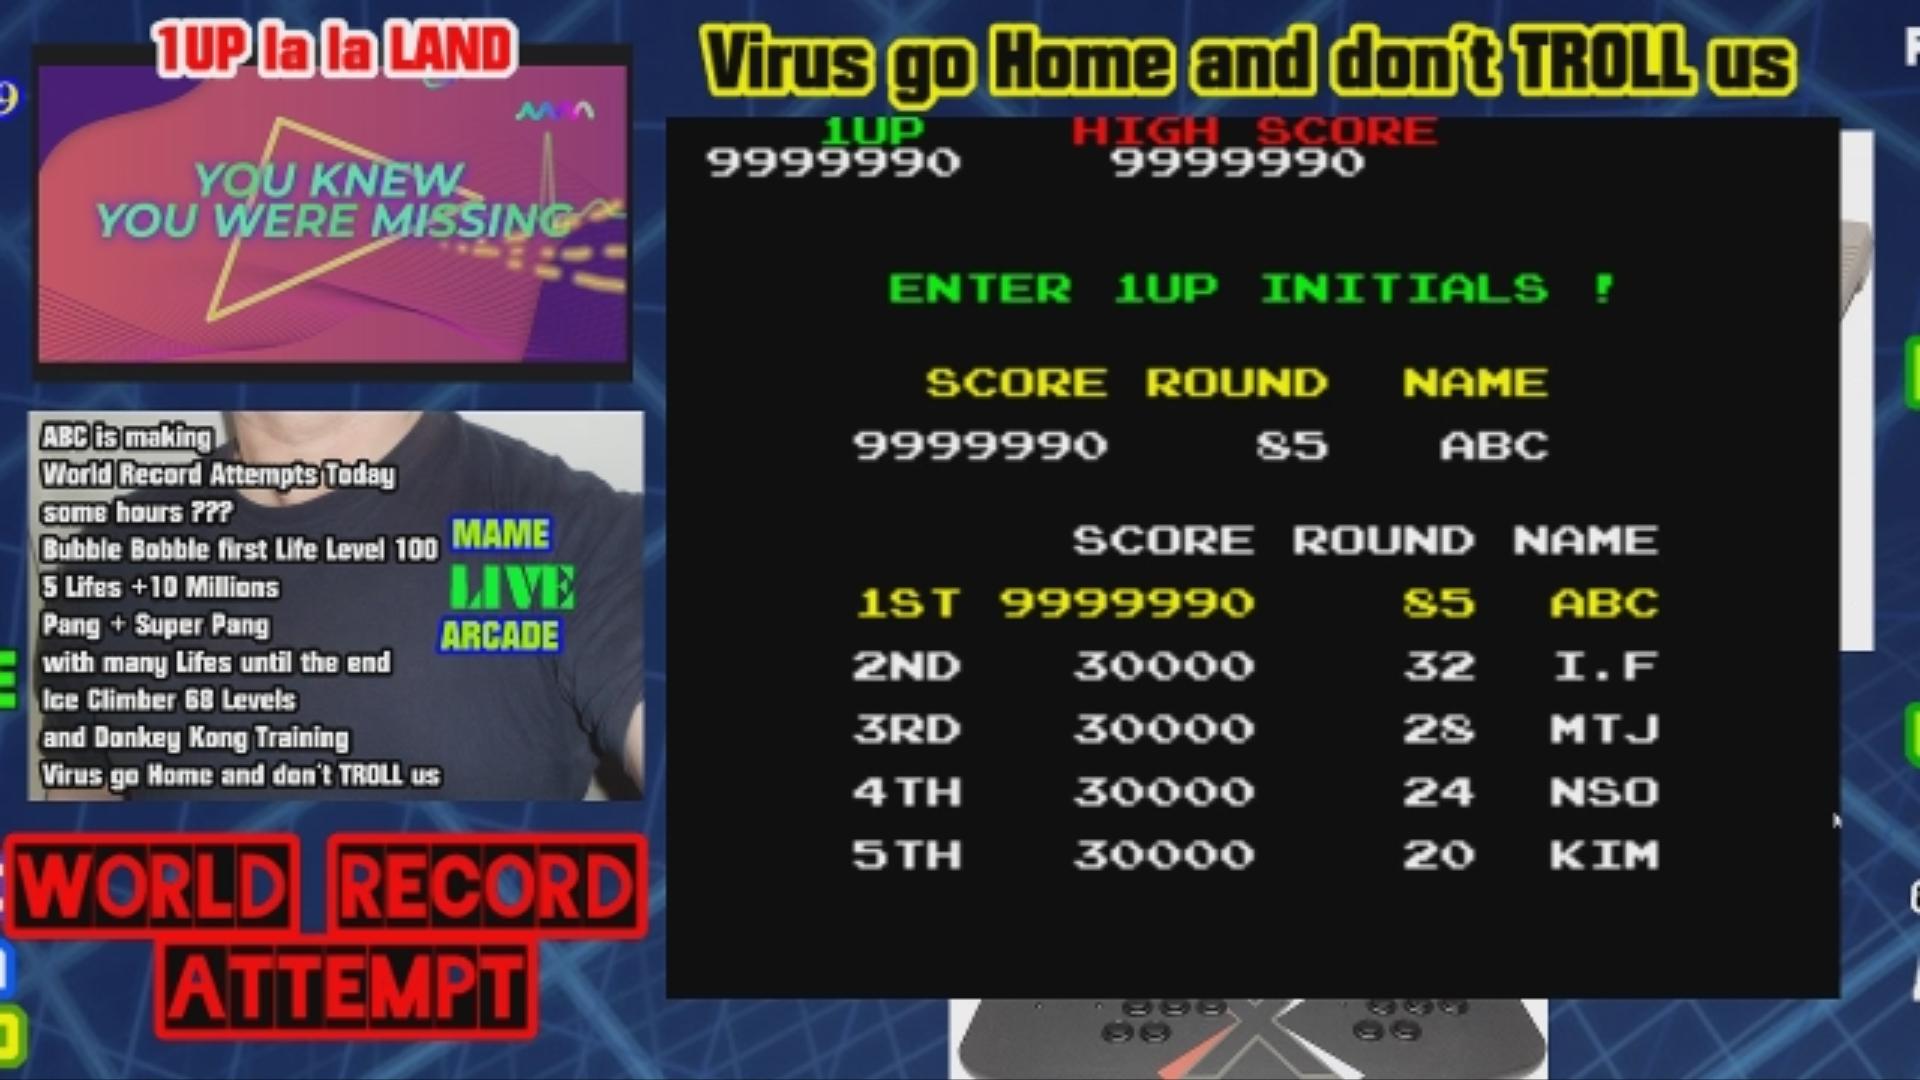 ArcadePlayerABC: Bubble Bobble (Arcade Emulated / M.A.M.E.) 9,999,990 points on 2020-04-12 10:12:29